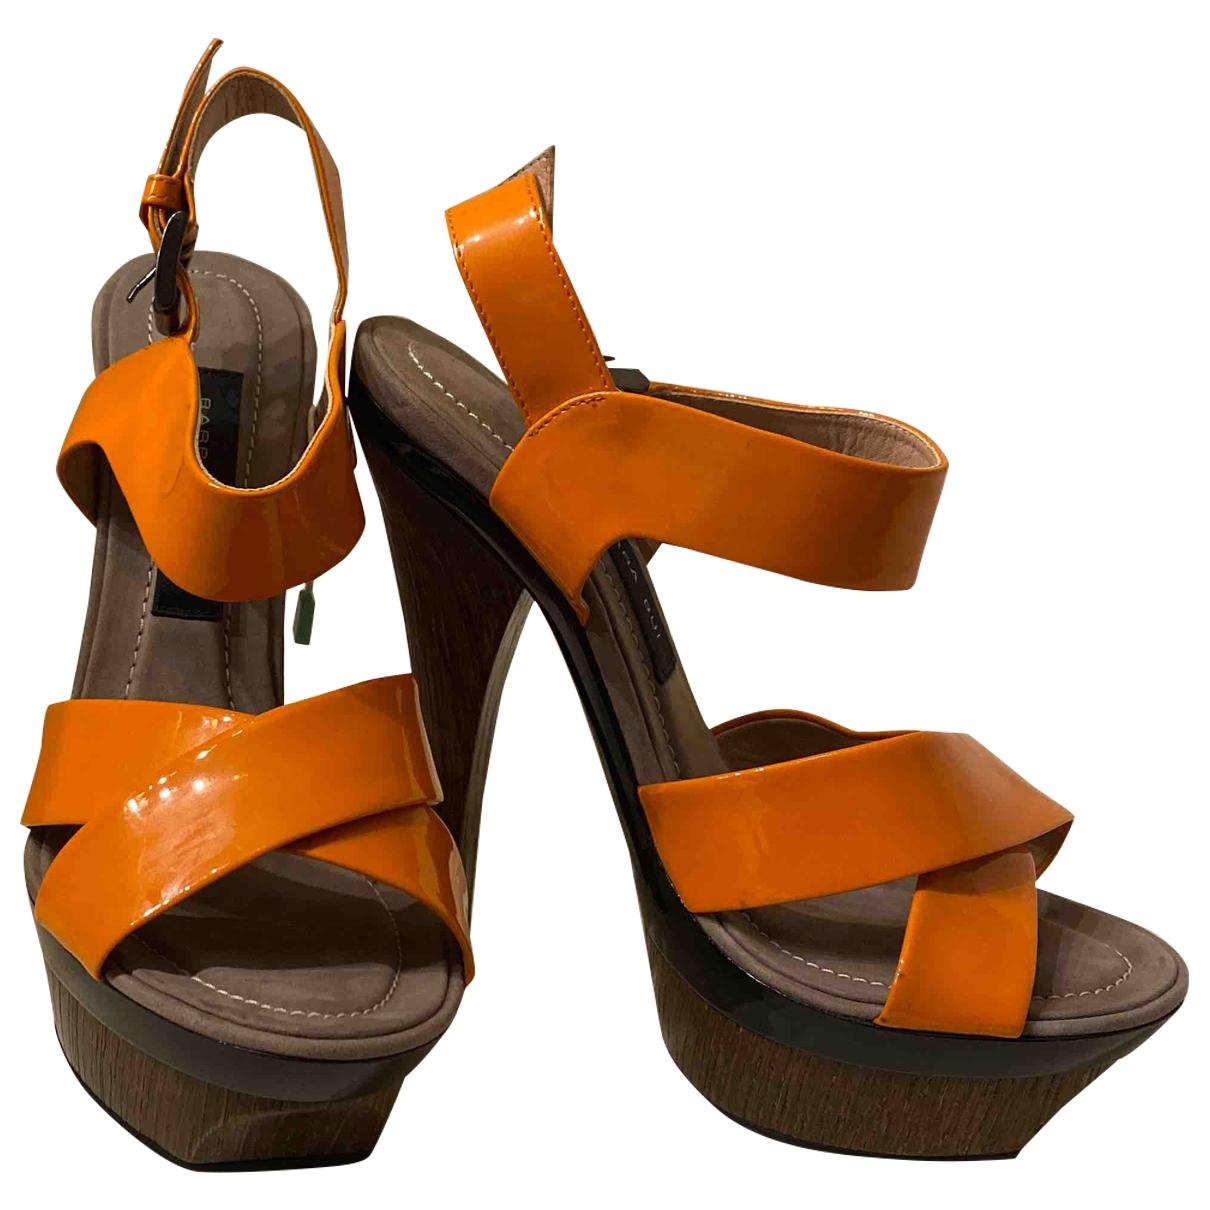 Sandalias de Charol Barbara Bui